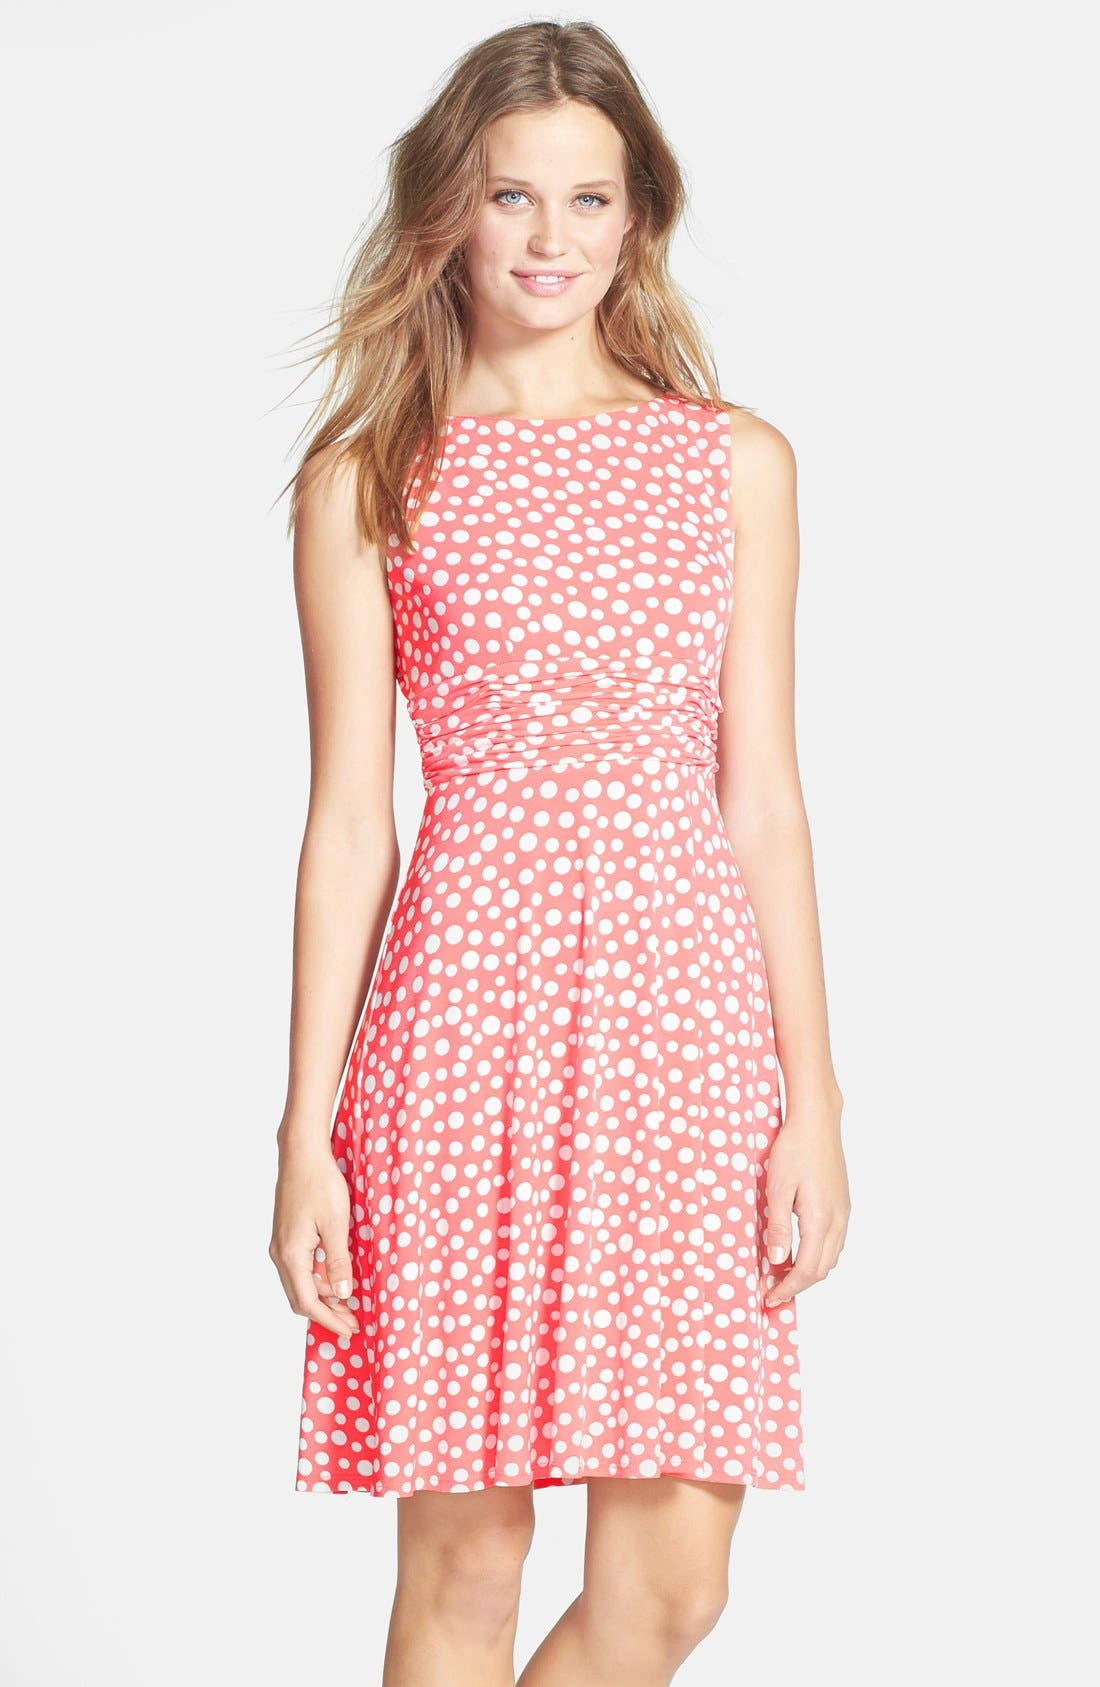 Alternate Image 1 Selected - Eliza J Polka Dot Jersey Fit & Flare Dress (Petite)